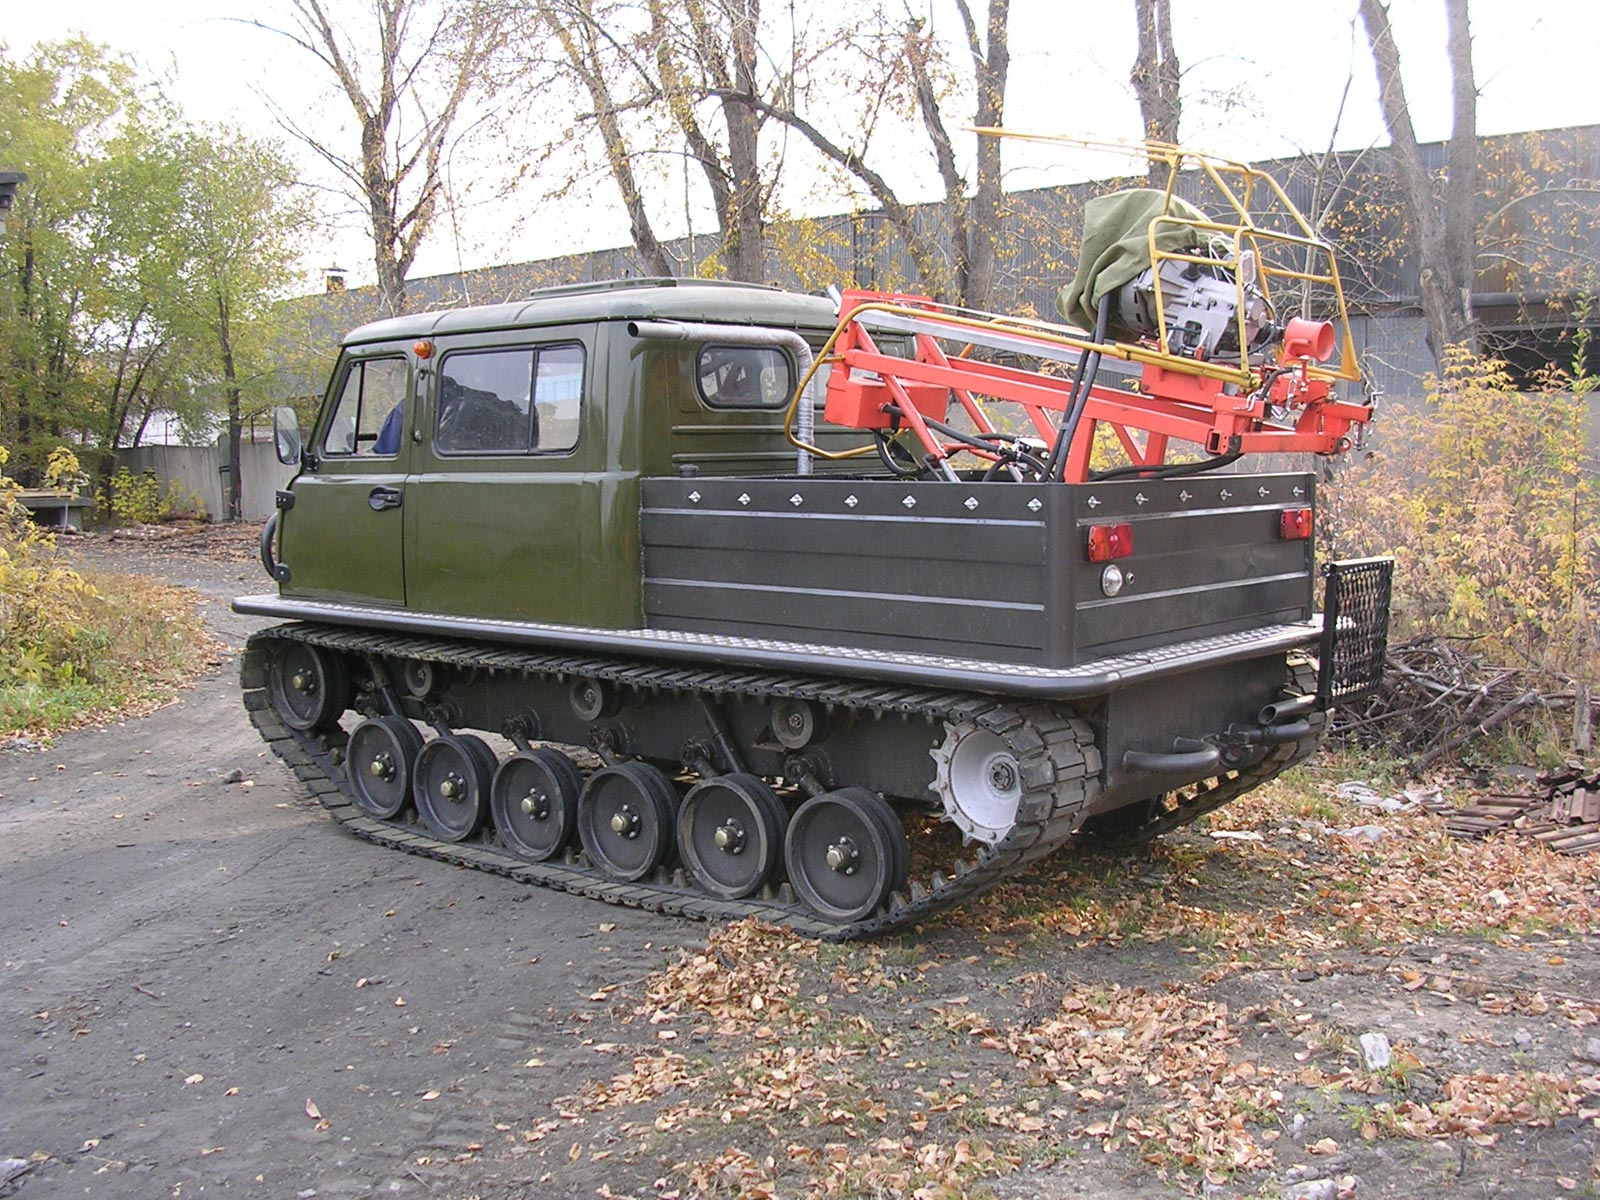 Установка буровая шнековая малогабаритная УБШМ-1-13 на базе УАЗ Узола